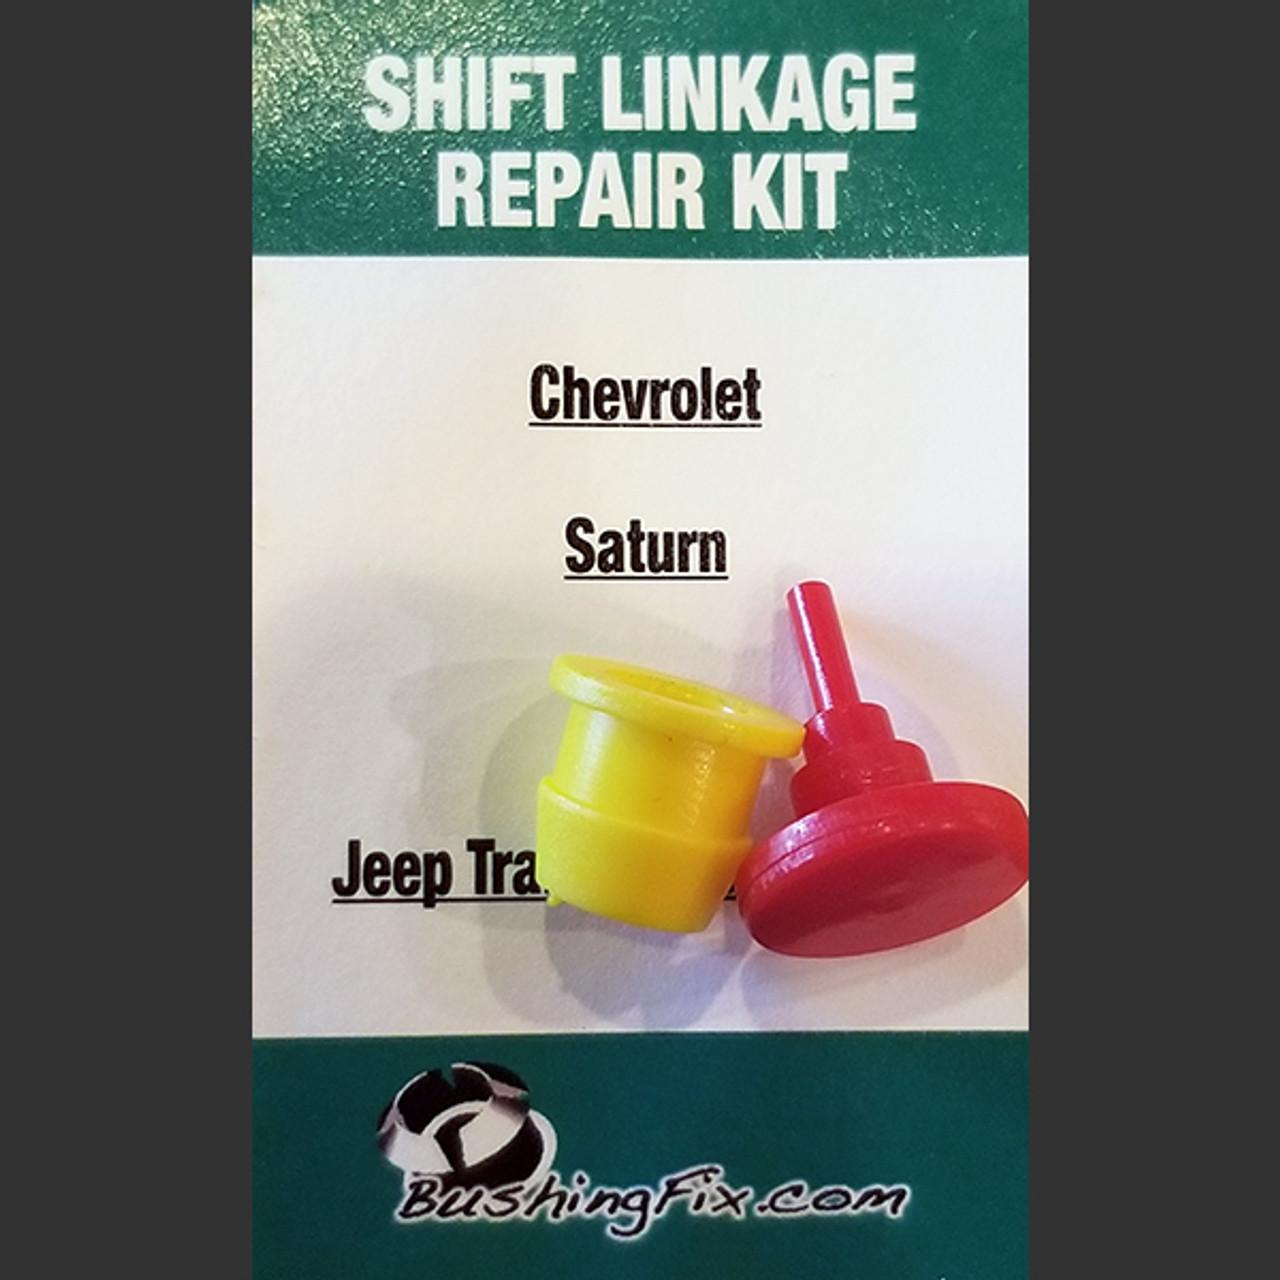 Pontiac Pursuit transmission shifter linkage repair kit